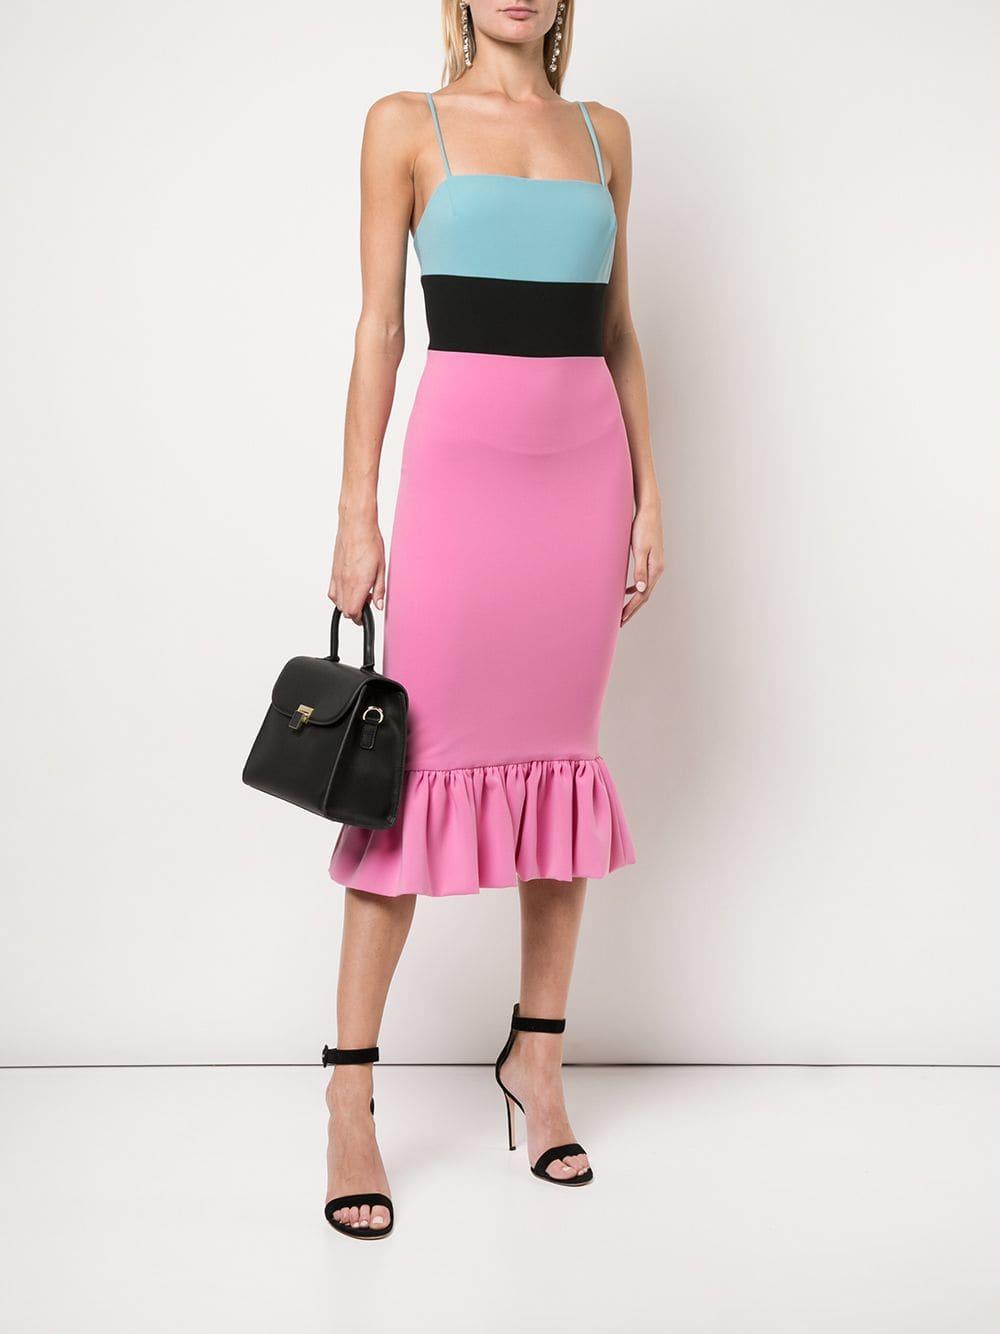 01e3342fcb52c Christian Siriano Fitted Peplum Midi Dress in Pink - Lyst